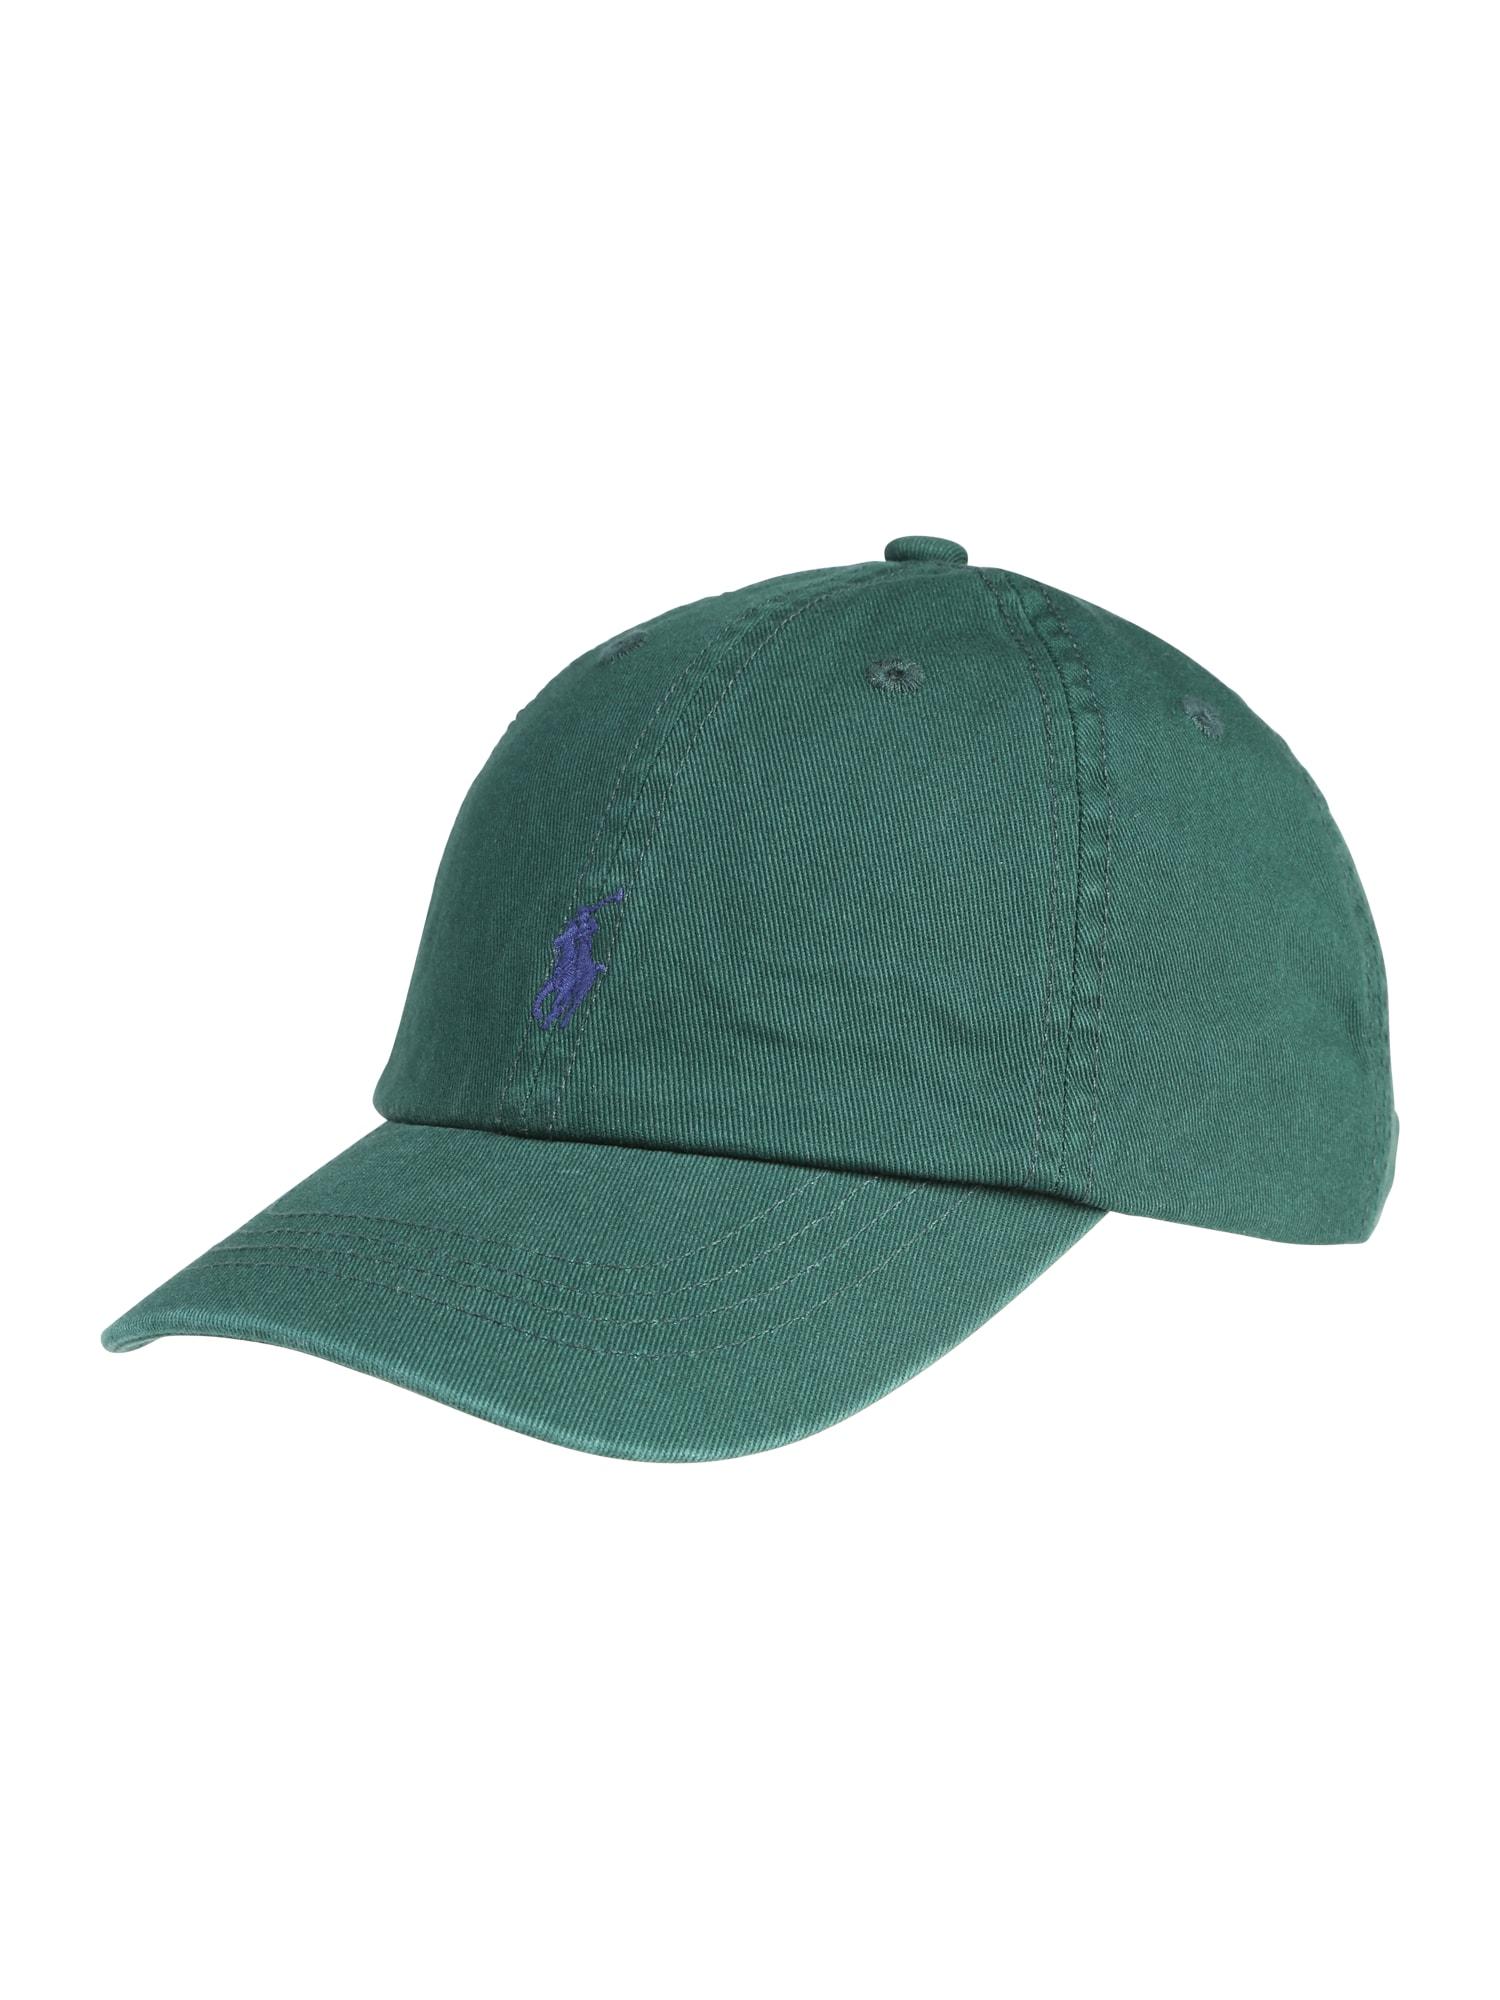 Klobouk CHINO TWILL-CLASSIC CAP-AC-HAT zelená POLO RALPH LAUREN